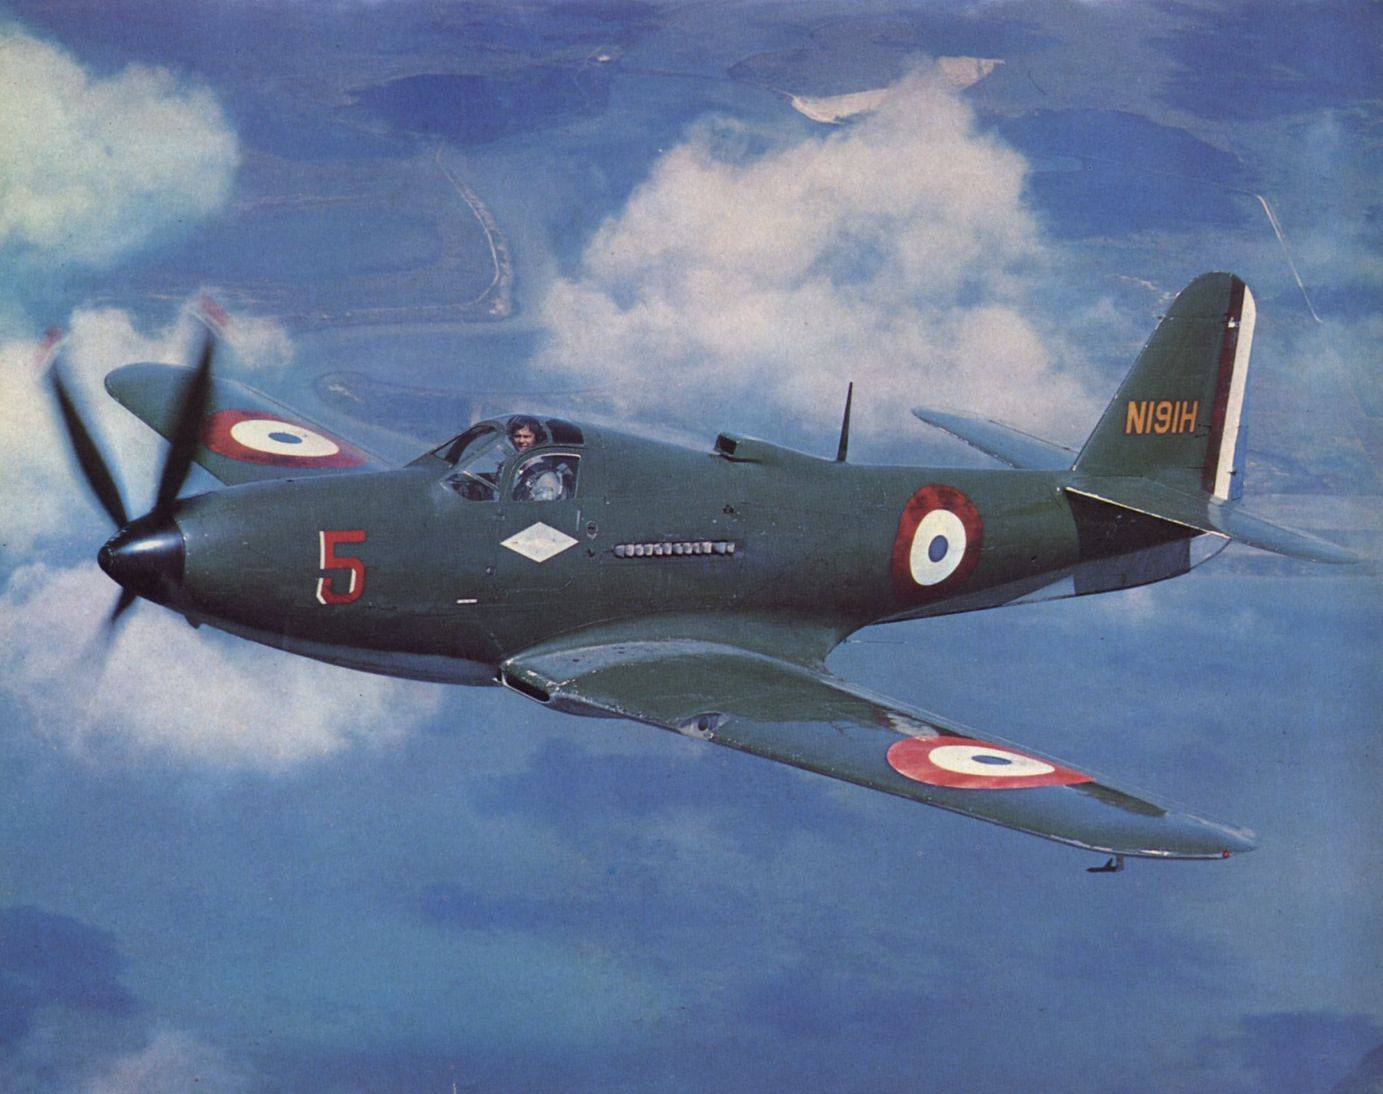 Истребитель-бомбардировщик Bell P-63 Kingcobra